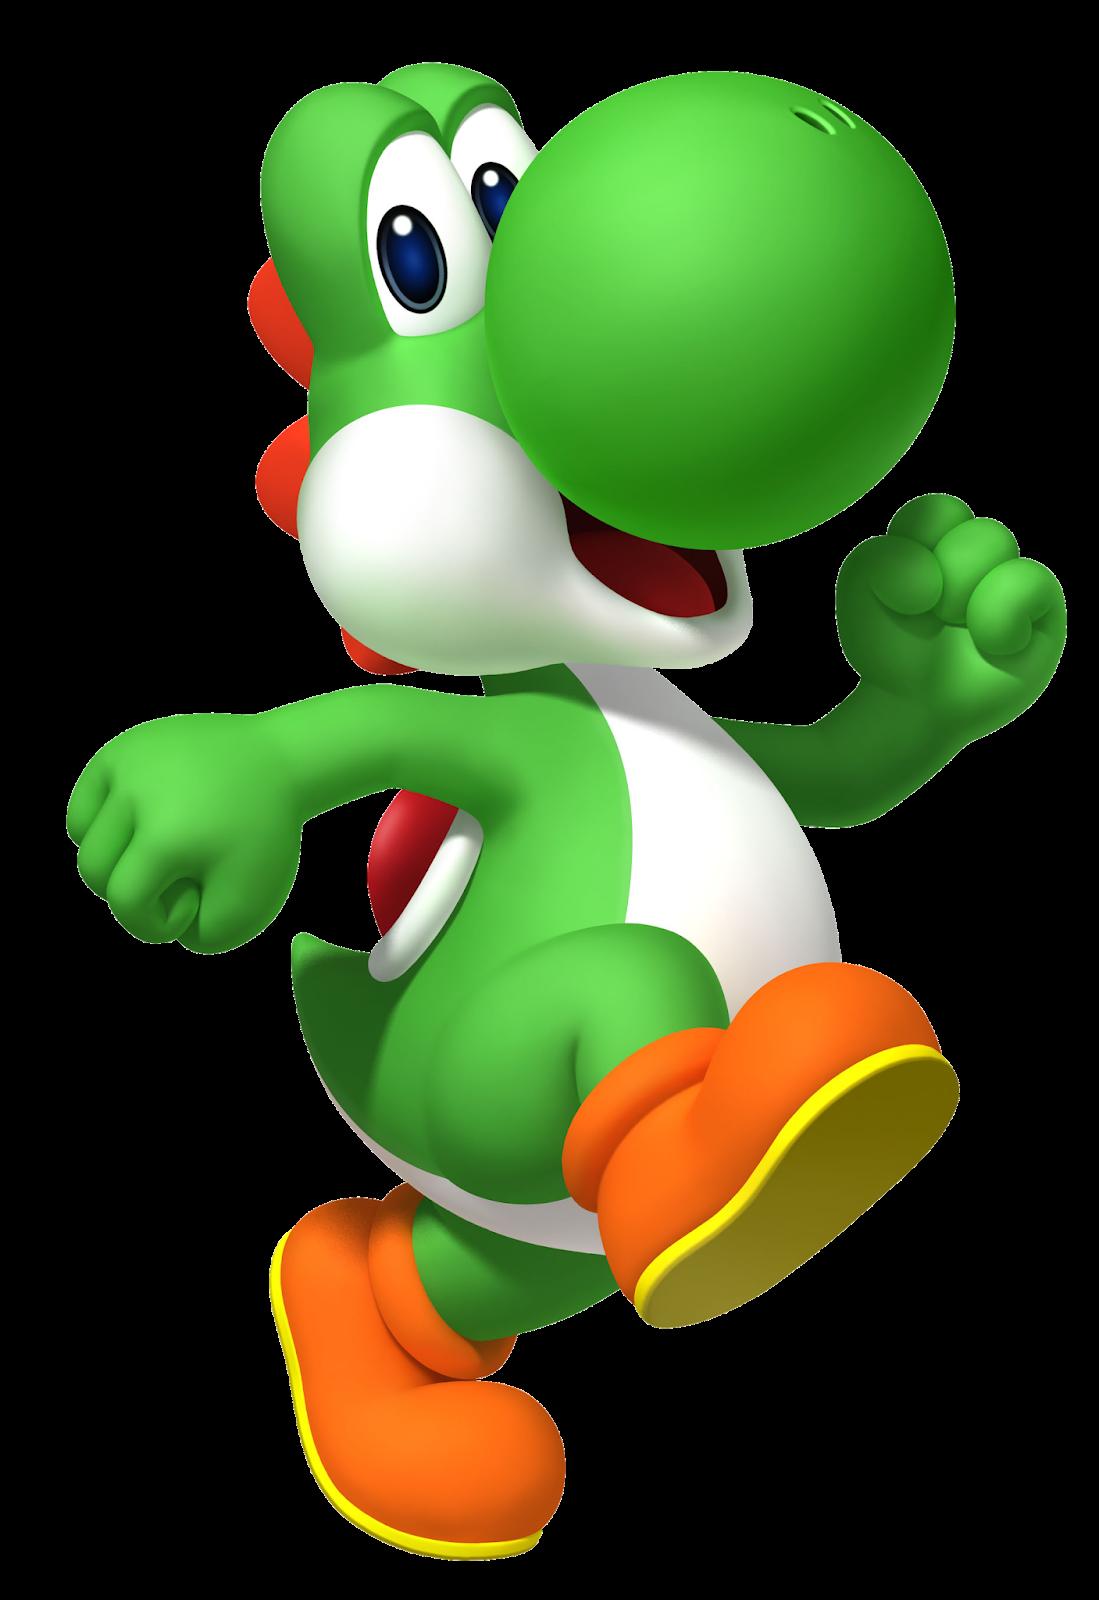 Mama Decoradora Super Mario Bros Png Descarga Gratis Super Mario Bros Party Ideas Festa De Super Mario Aniversario Super Mario